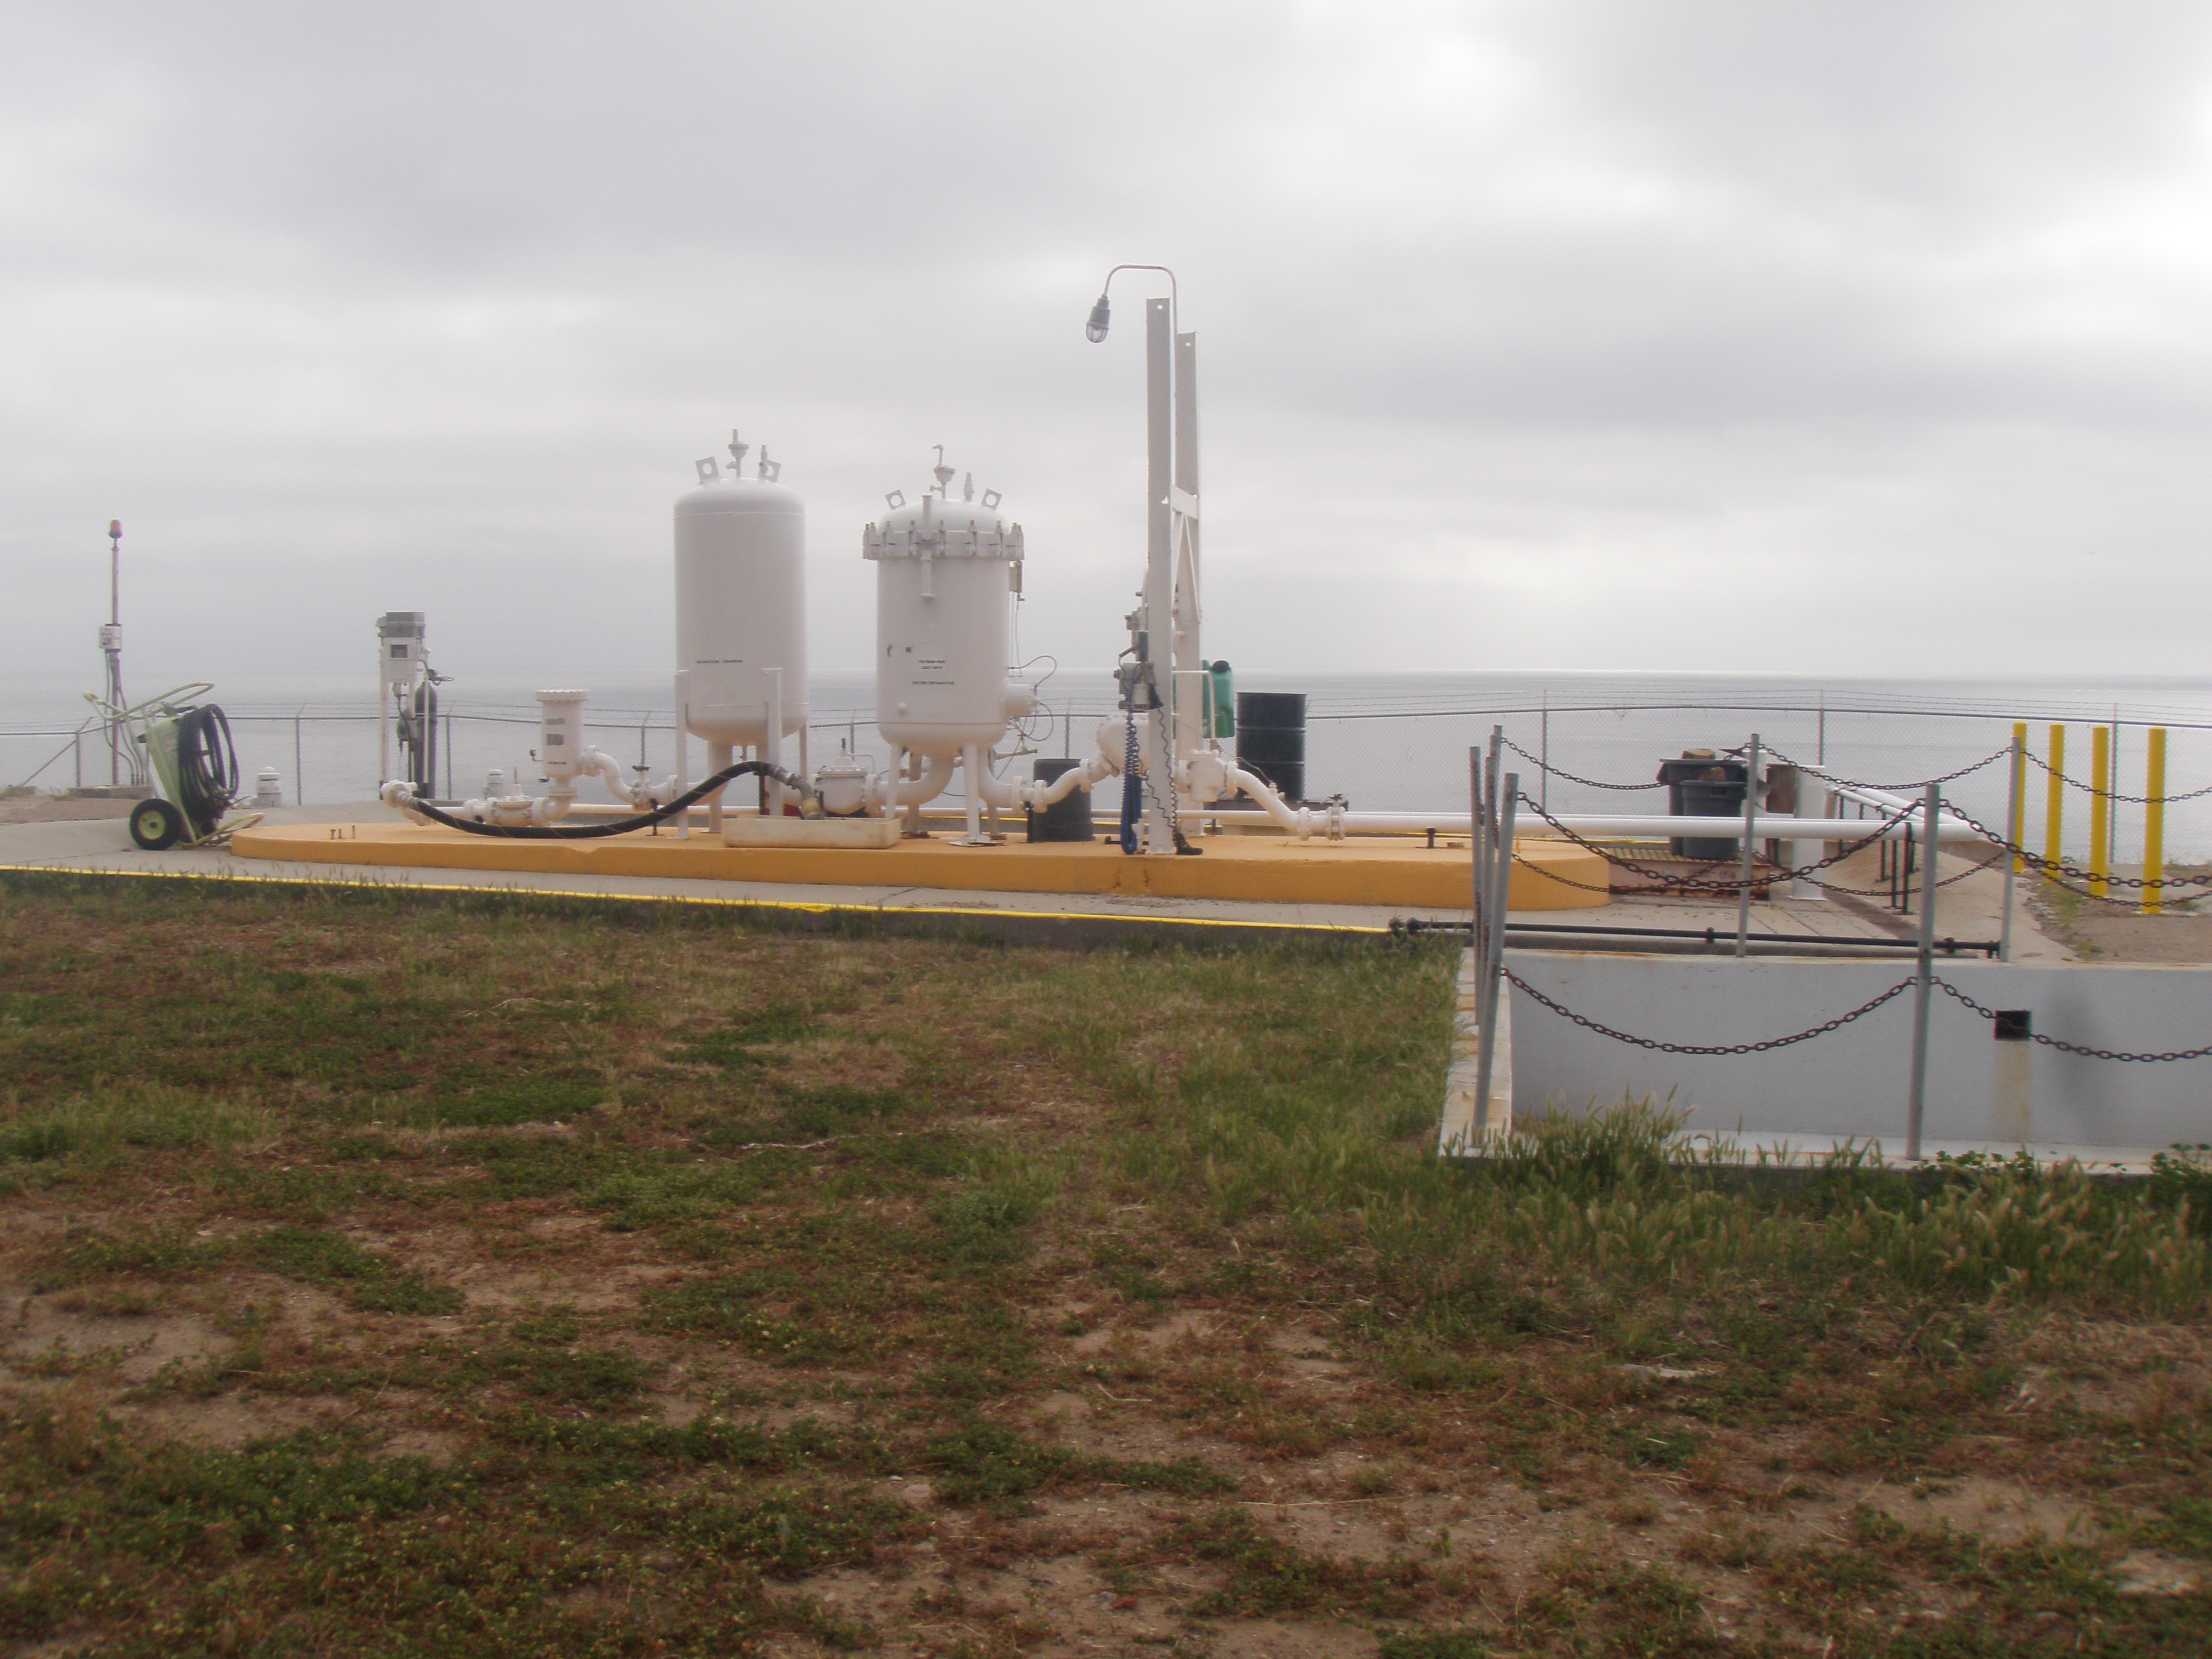 San Clemente Island Jet Fuel Storage Project, San Clemente Island CA